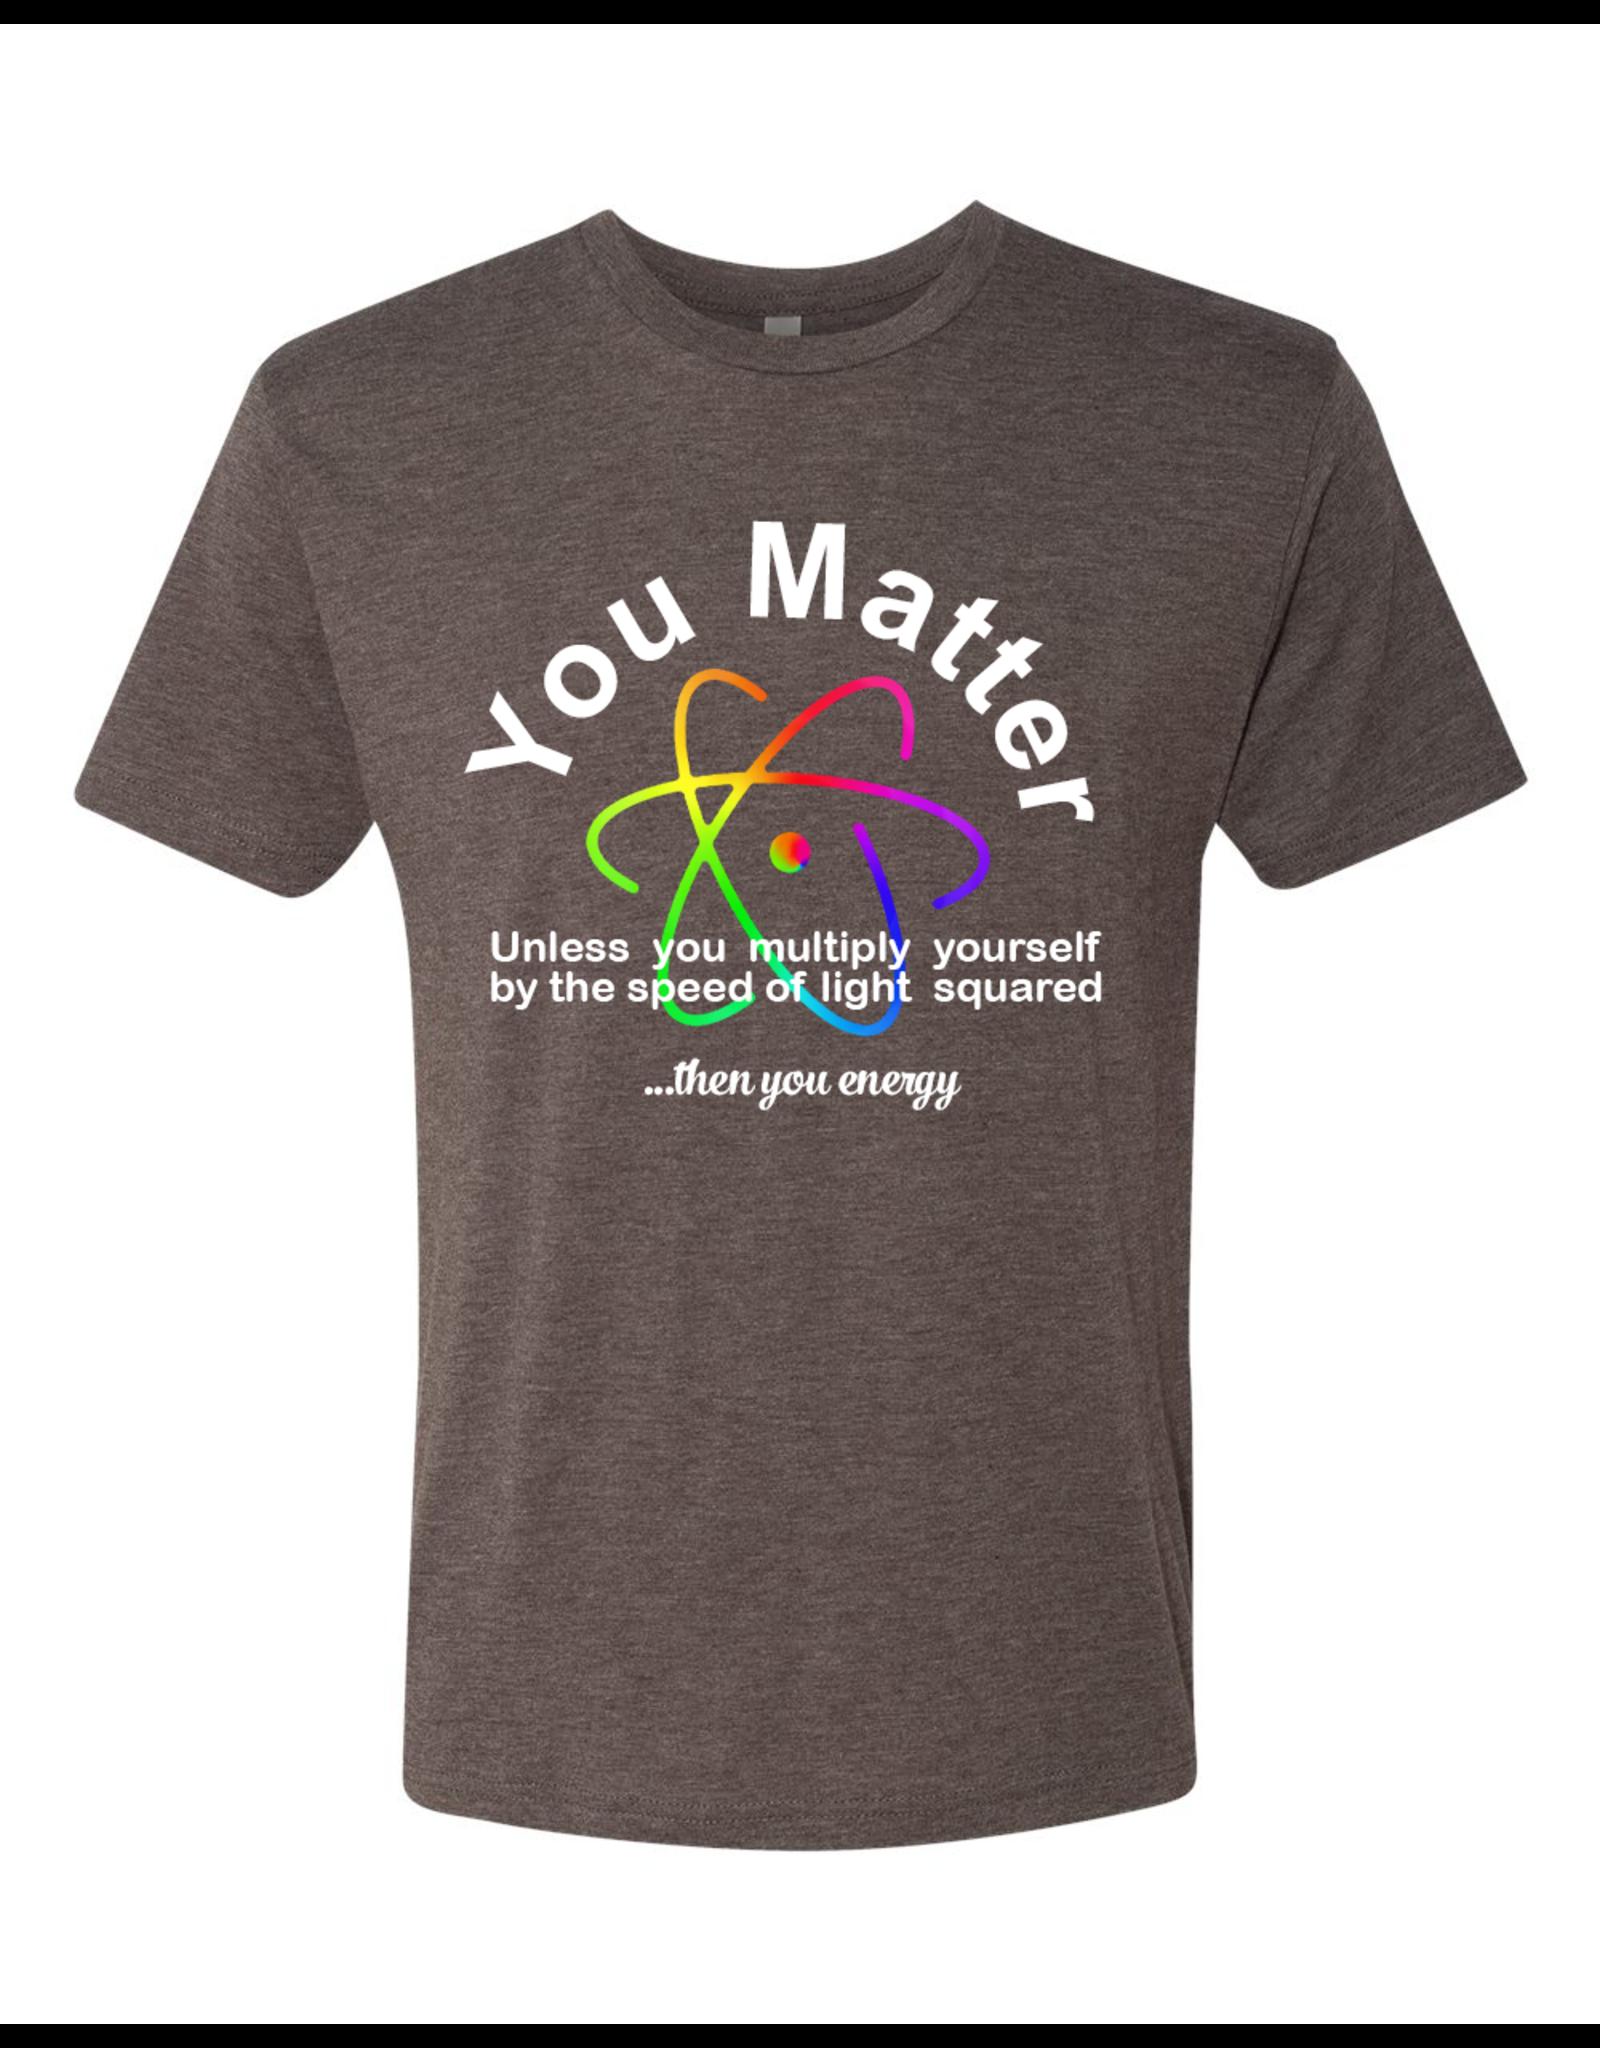 The Brooklyn Press You Matter T-shirt